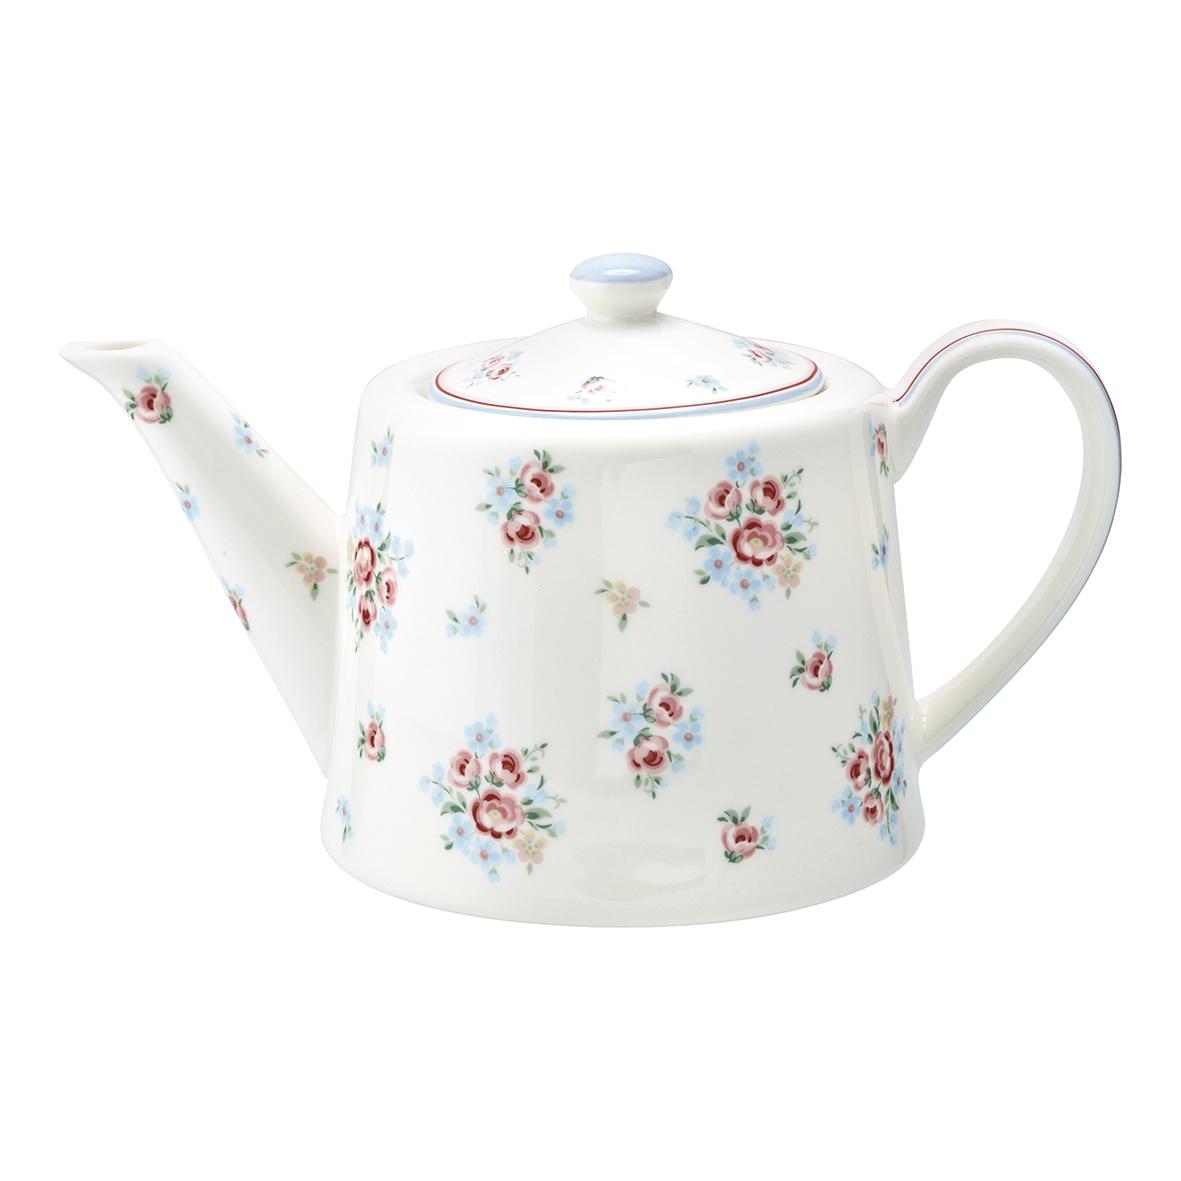 Greengate Teekanne oder Kaffeekanne Nicoline white